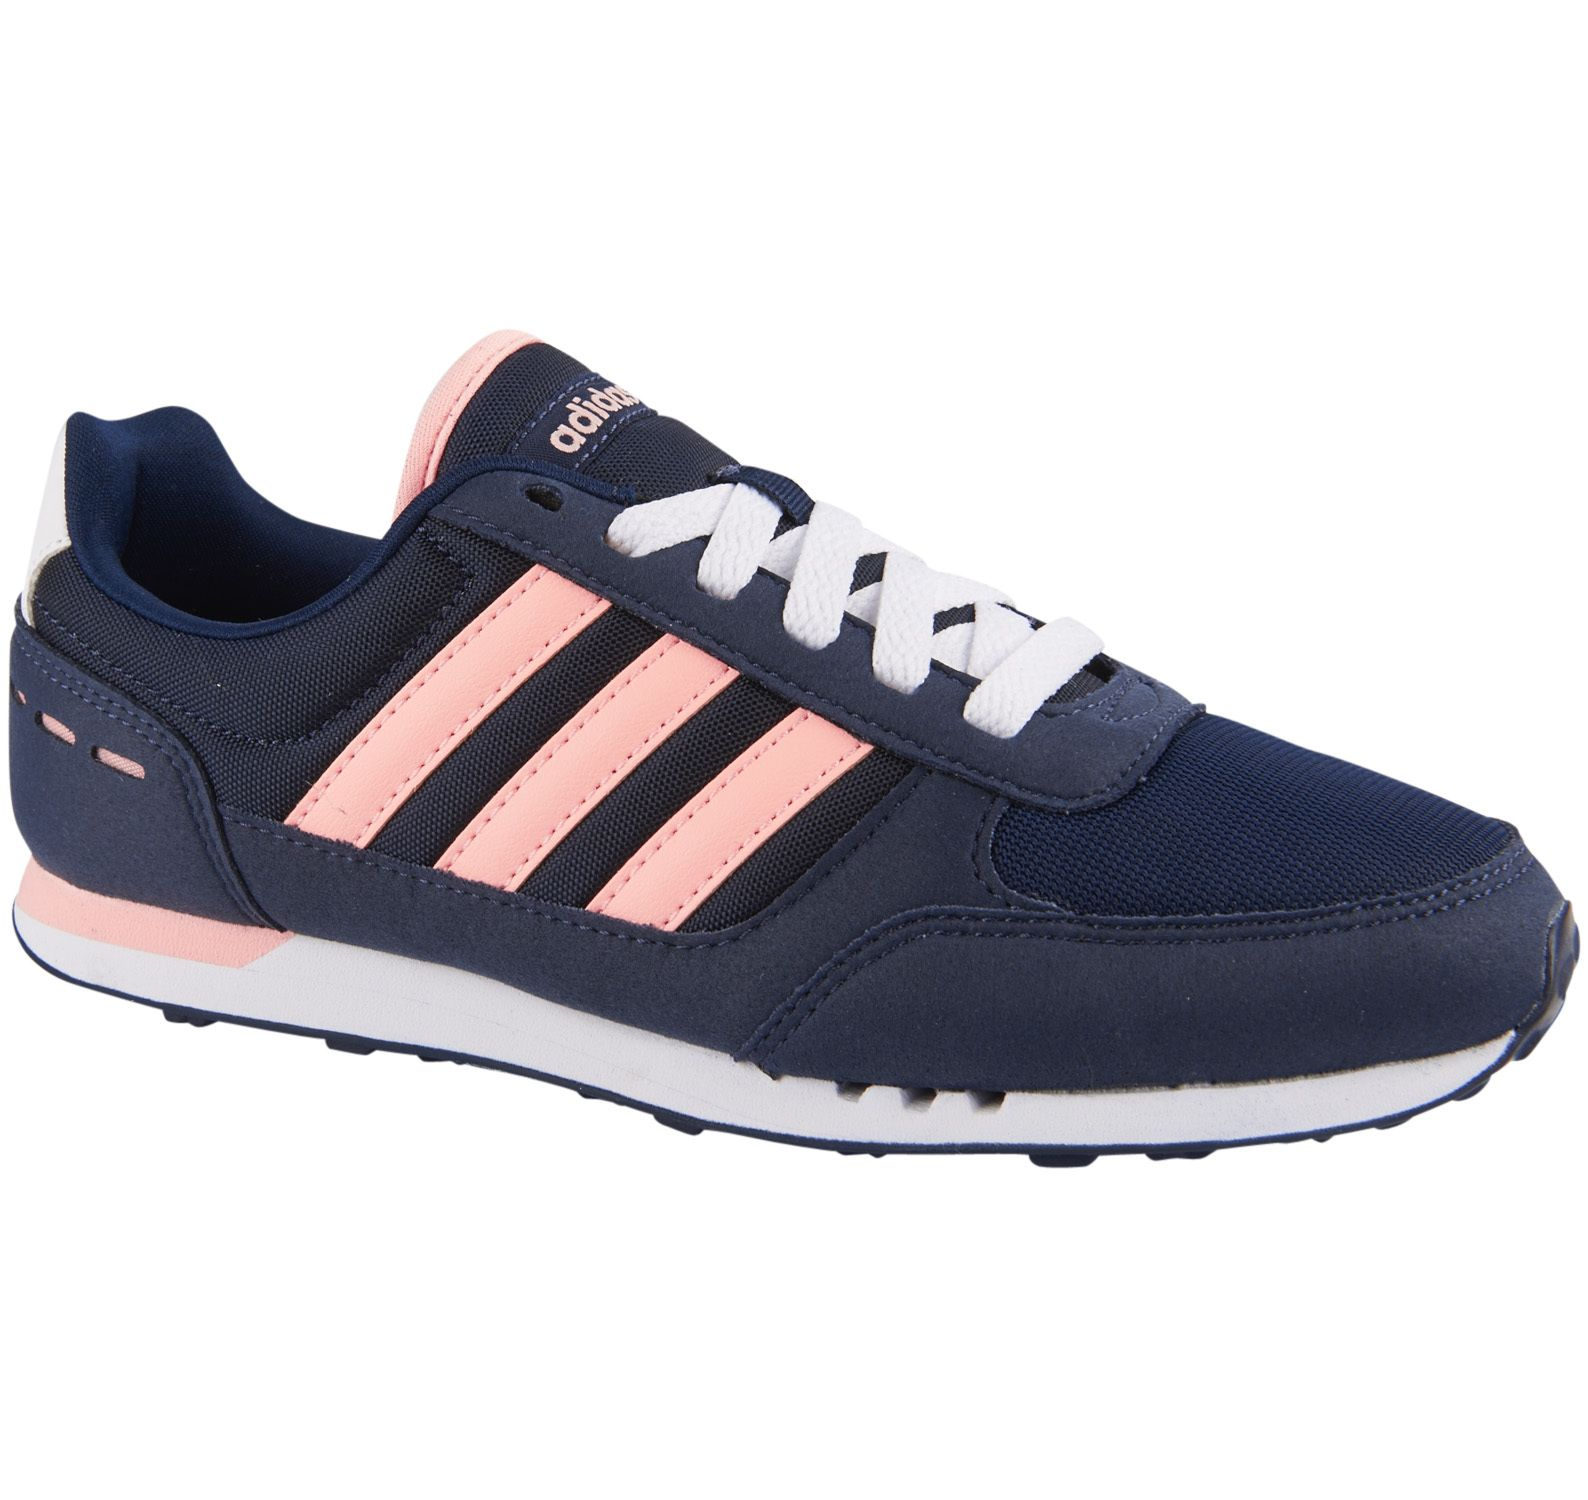 City Racer W, Conavy/Ltflor/Ftwwht, 7.5,  Sneakers